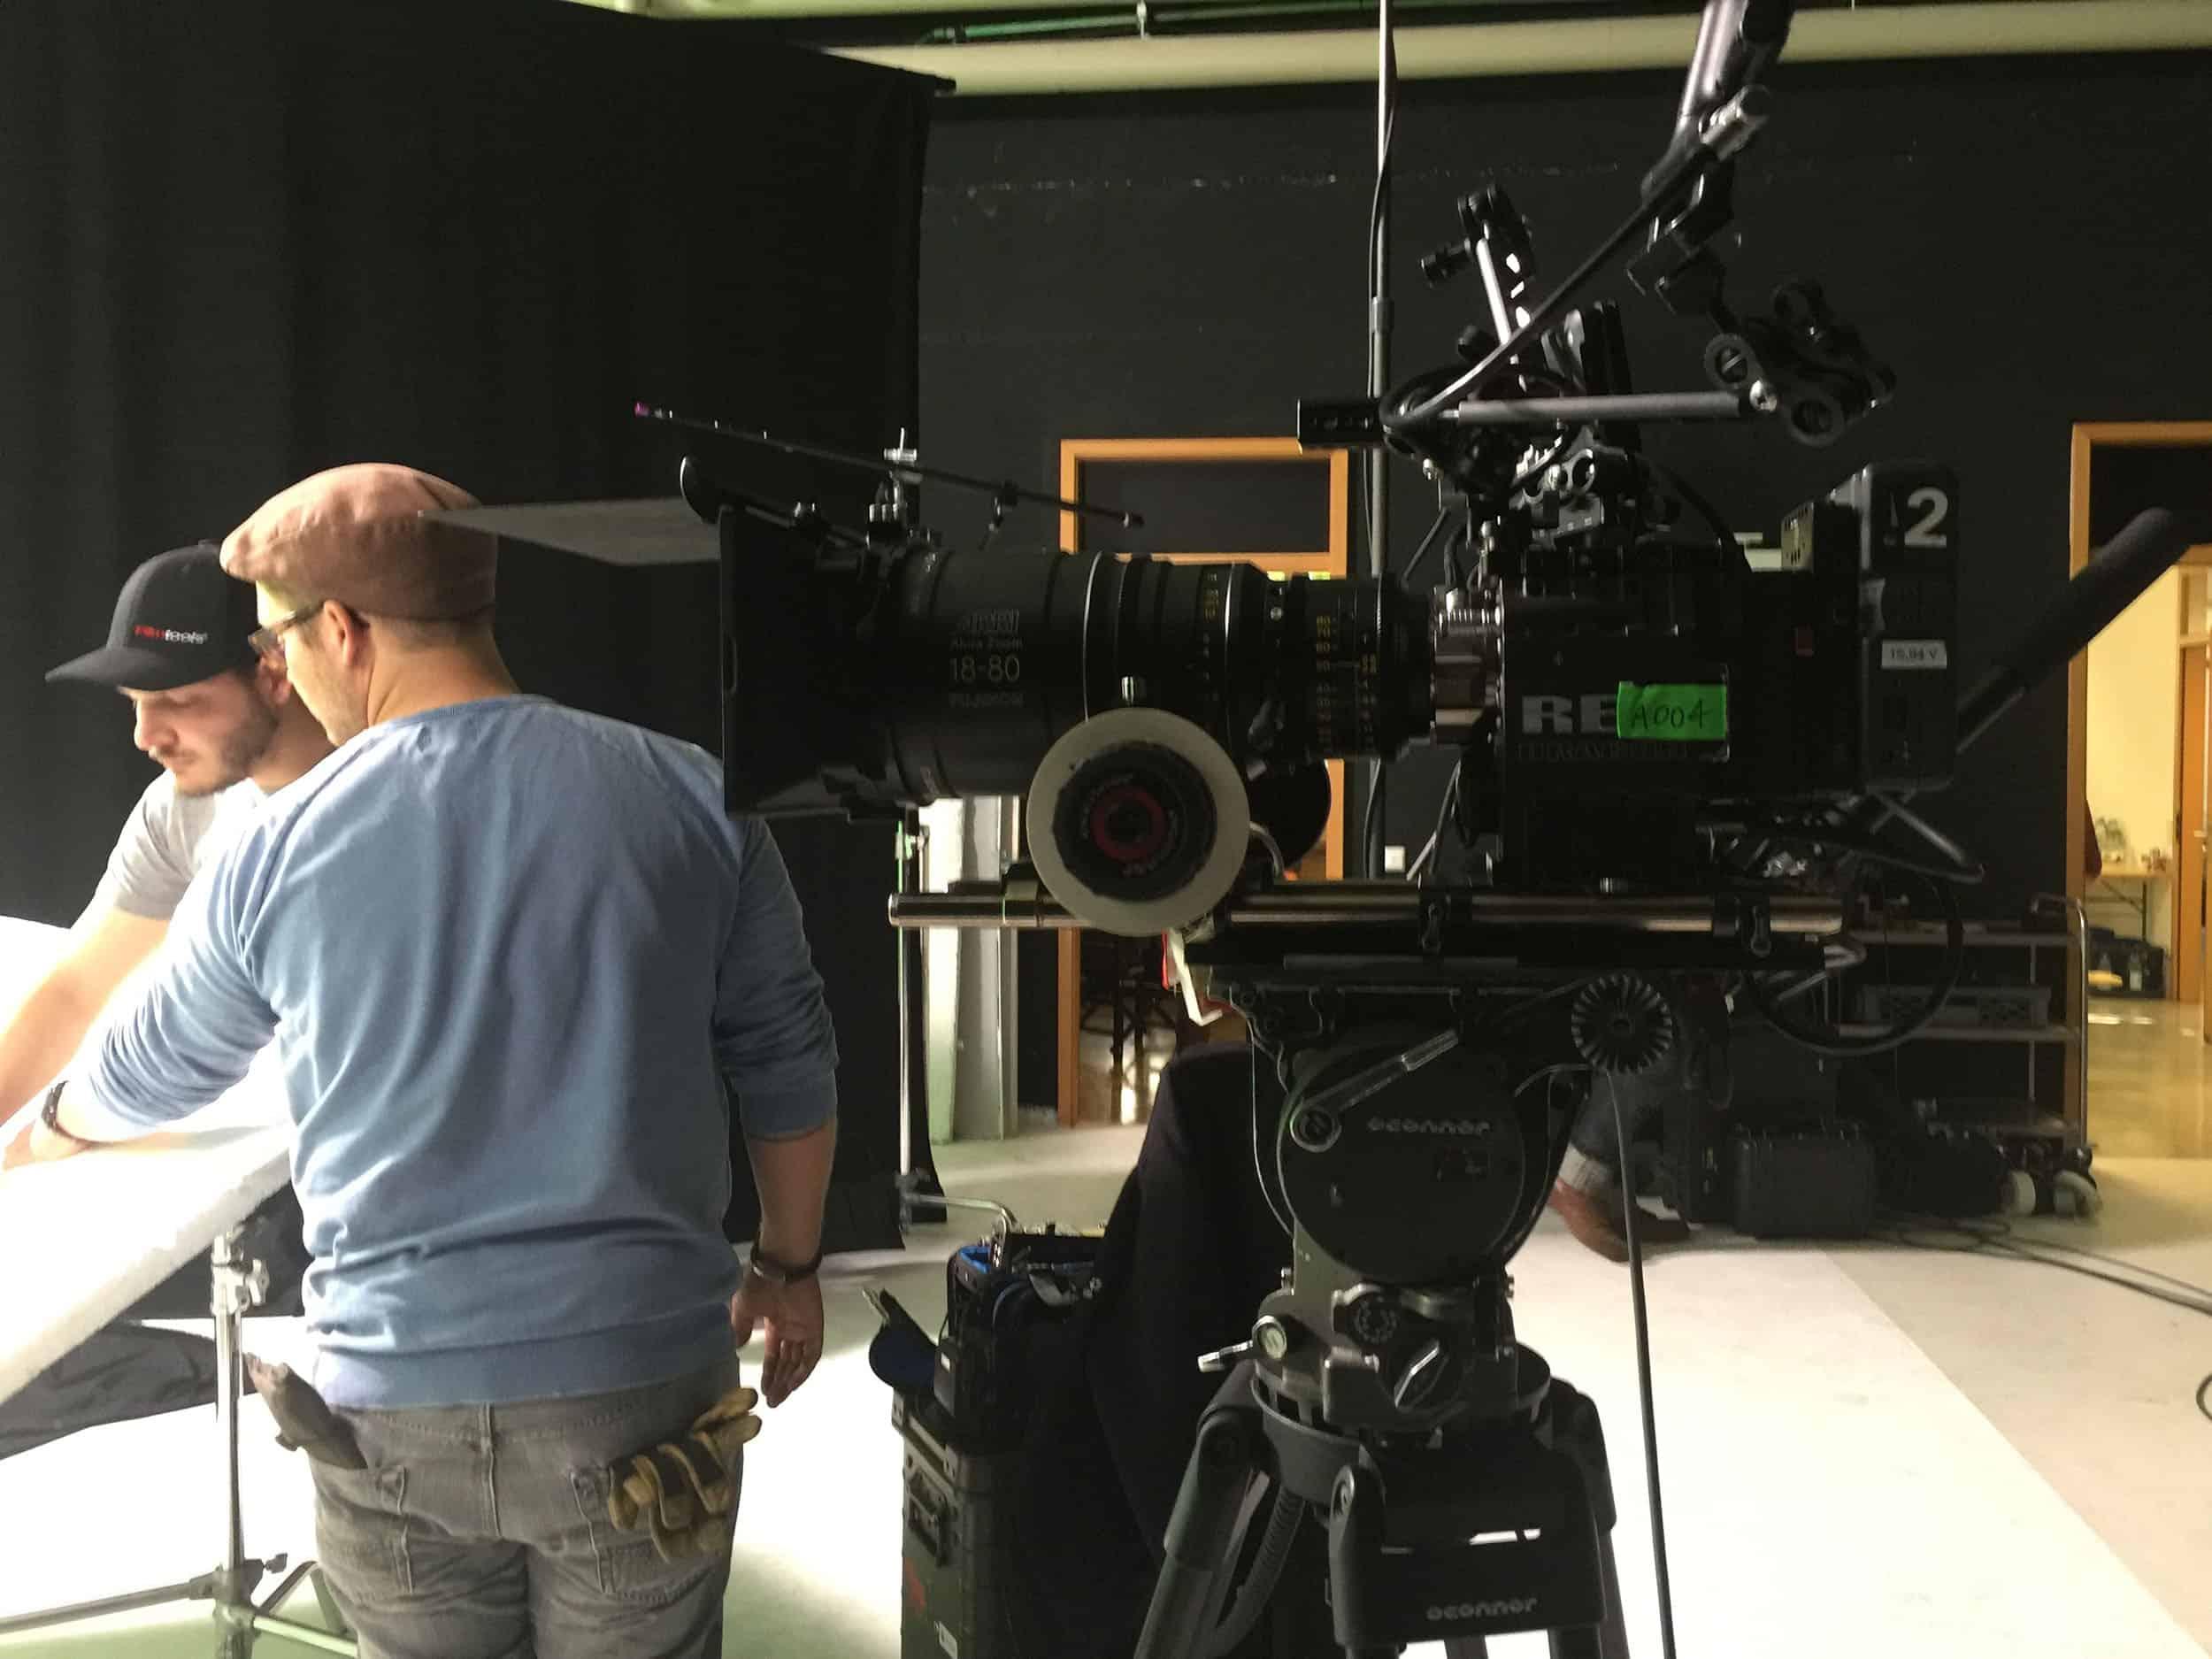 studio-ignatov-rolandversicherung-adokojo-tvcommercial-04